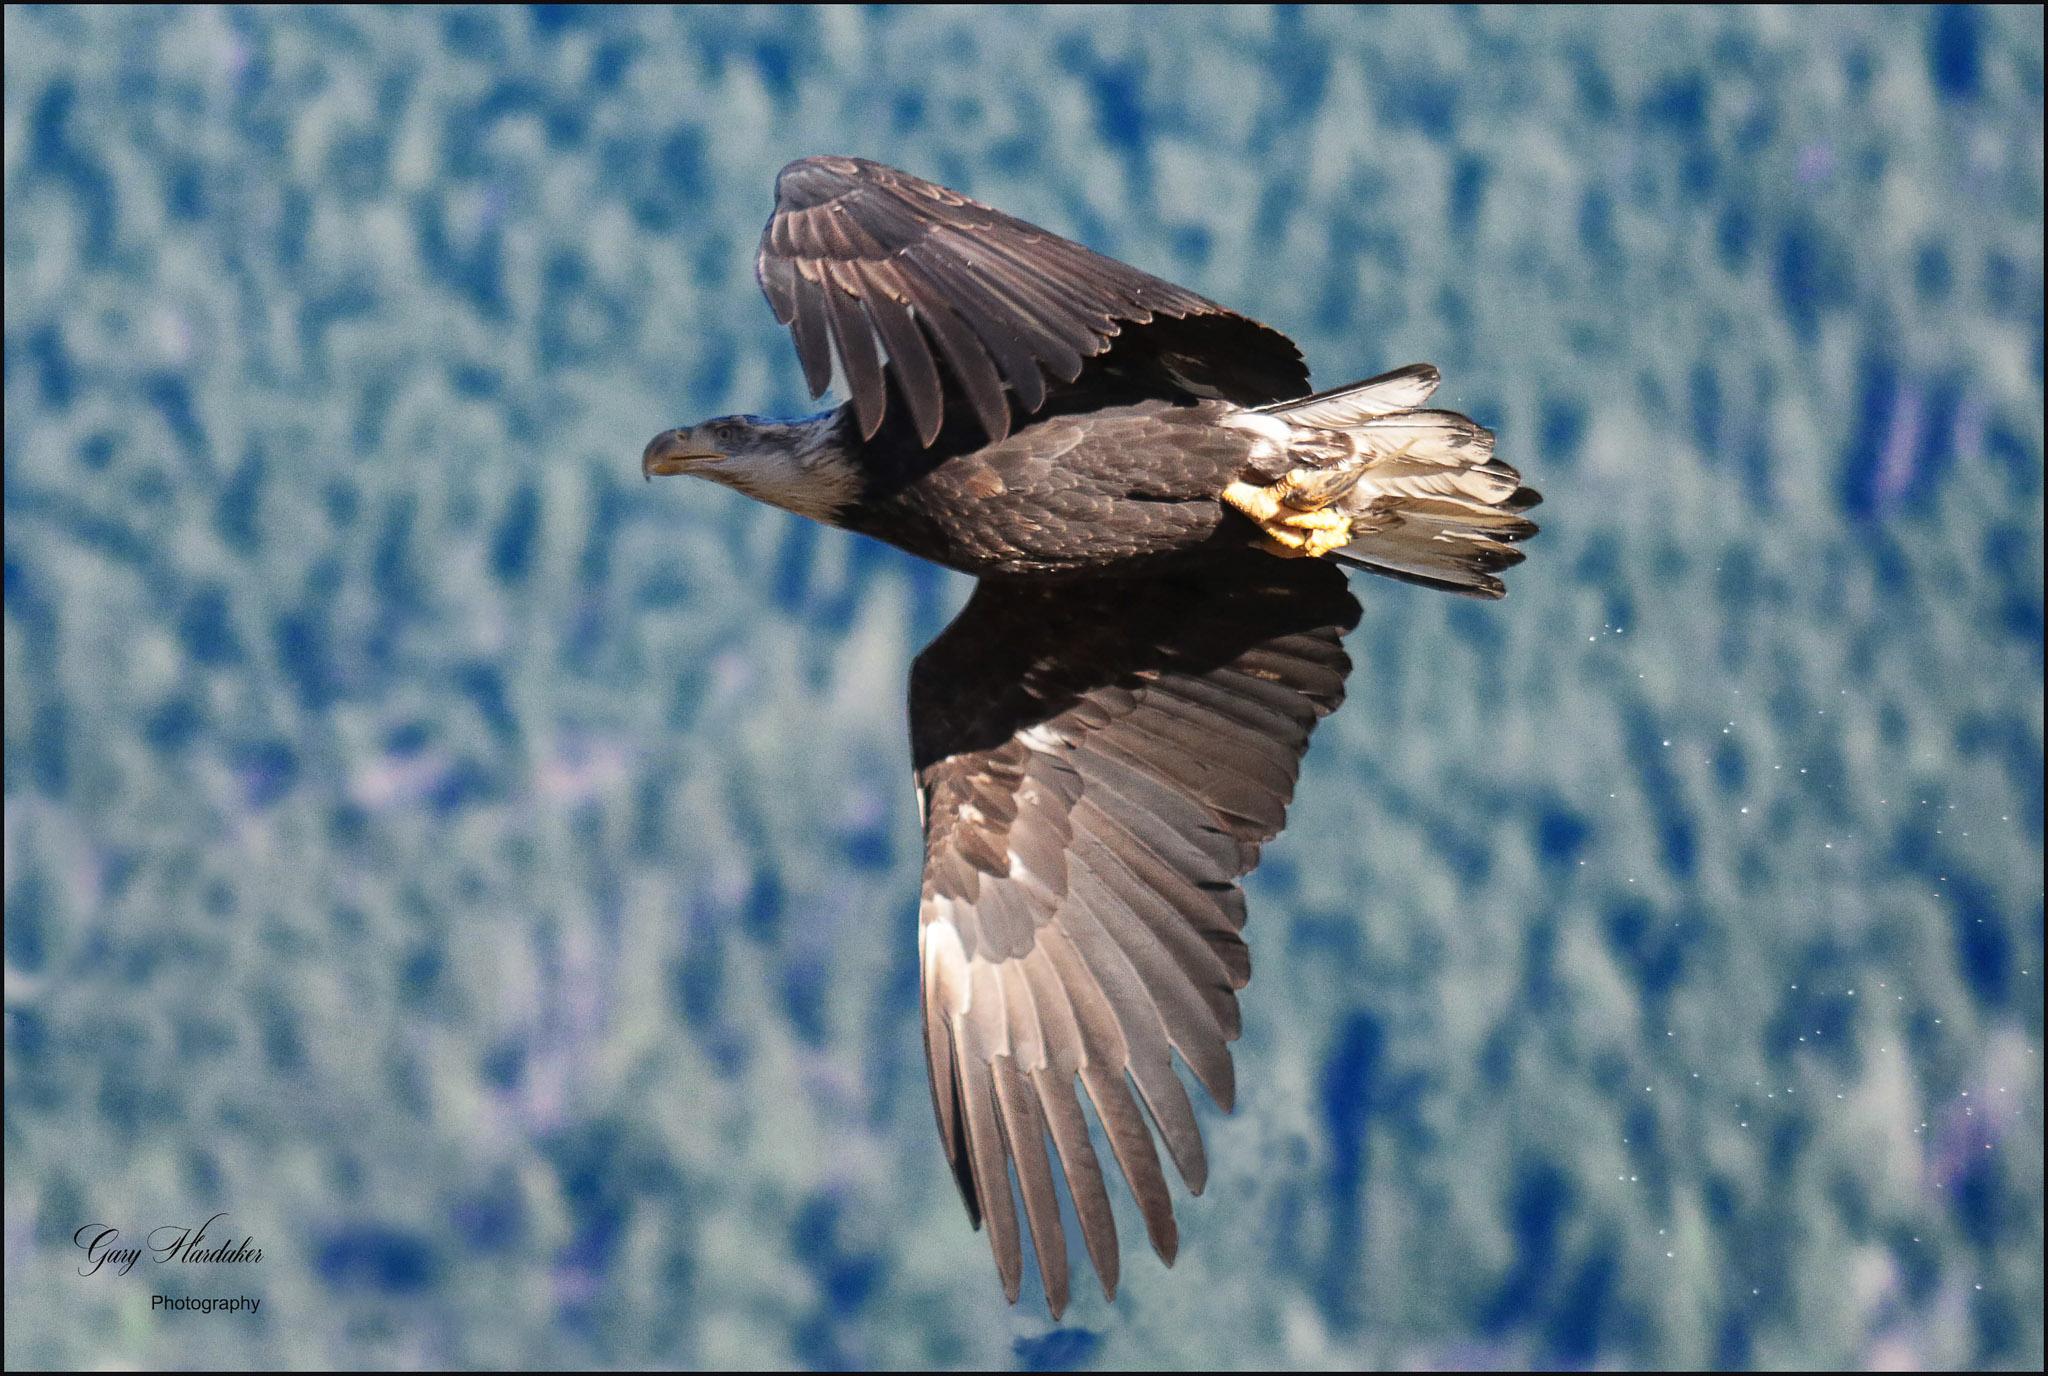 Gary Hardaker-Eagle on take-off (Harrison River)